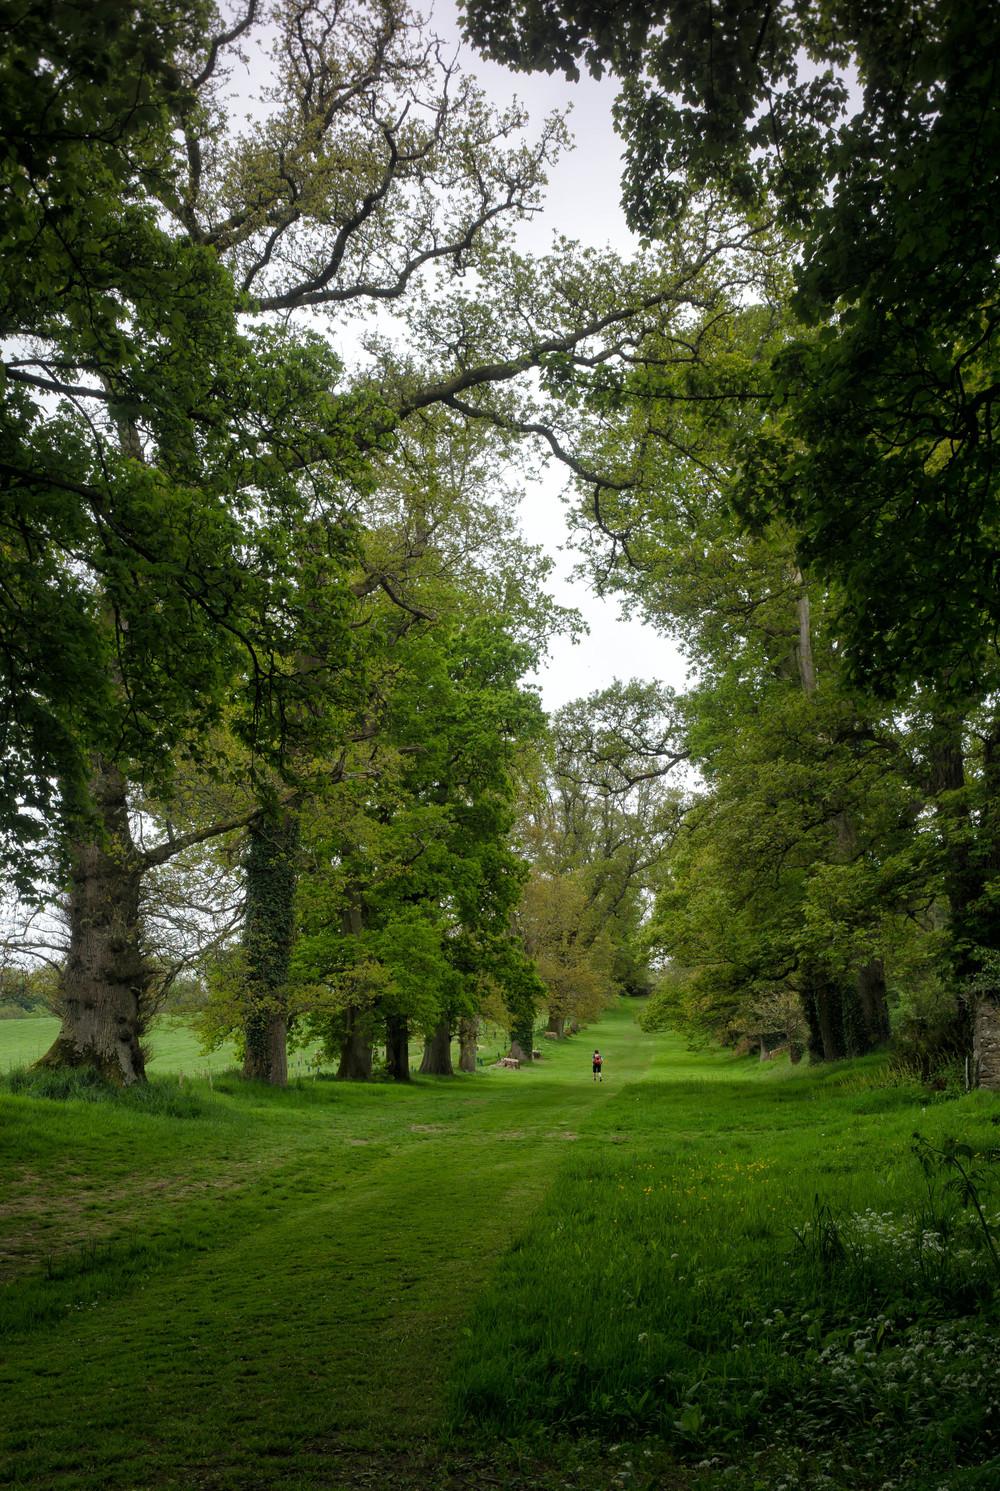 Kilmacurragh Arboretum May 2016 6 Tree Avenue 1 (1 of 1).jpg